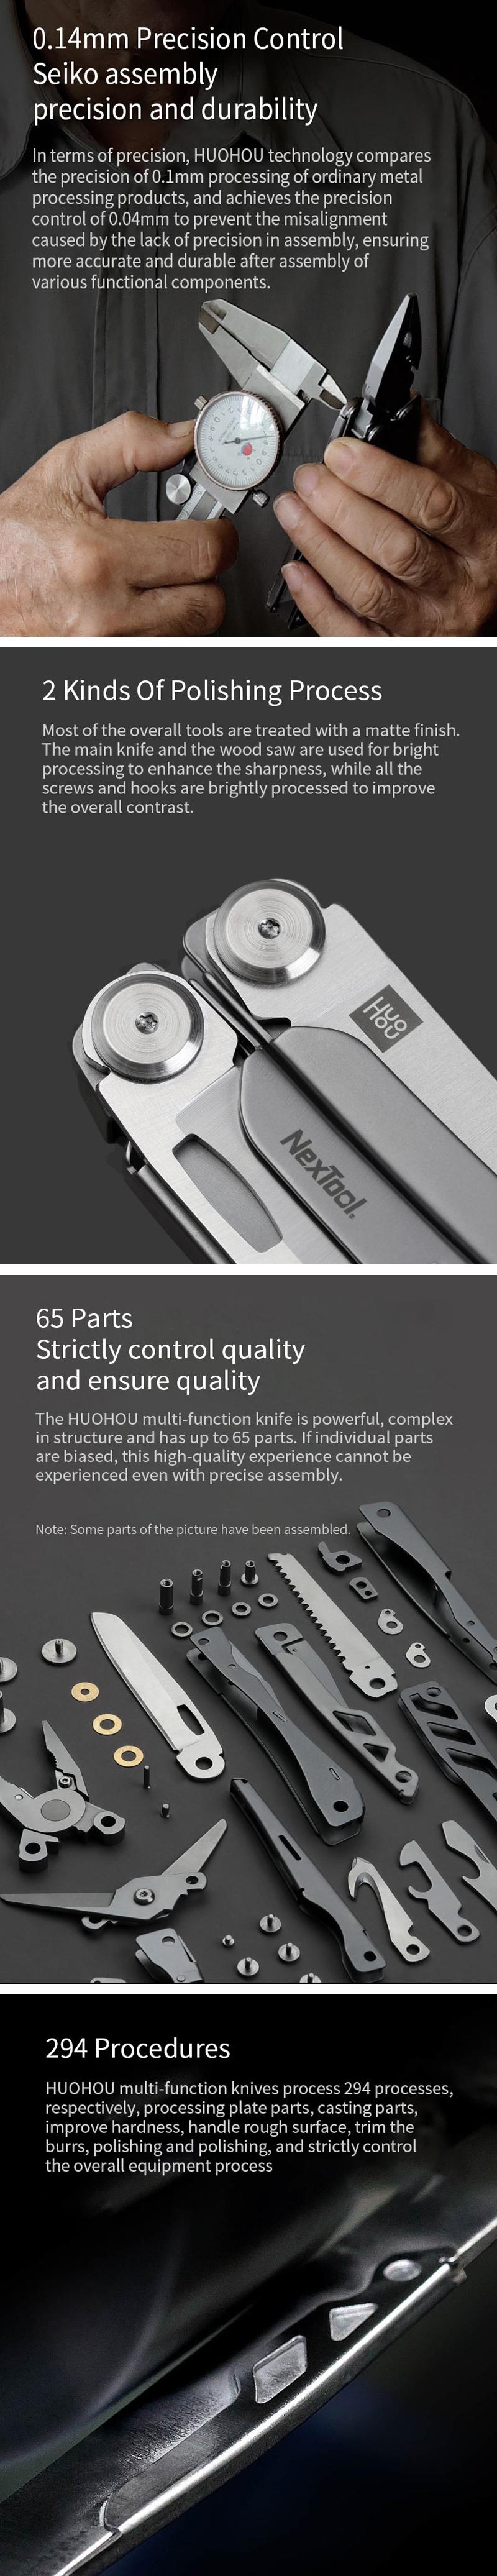 HUOHOU Multi-function Cutter 15 Functions Folding Bottle Opener Screwdriver / Pliers / Scissor / Wood Saw Tools Kit from xiaomi youpin 19